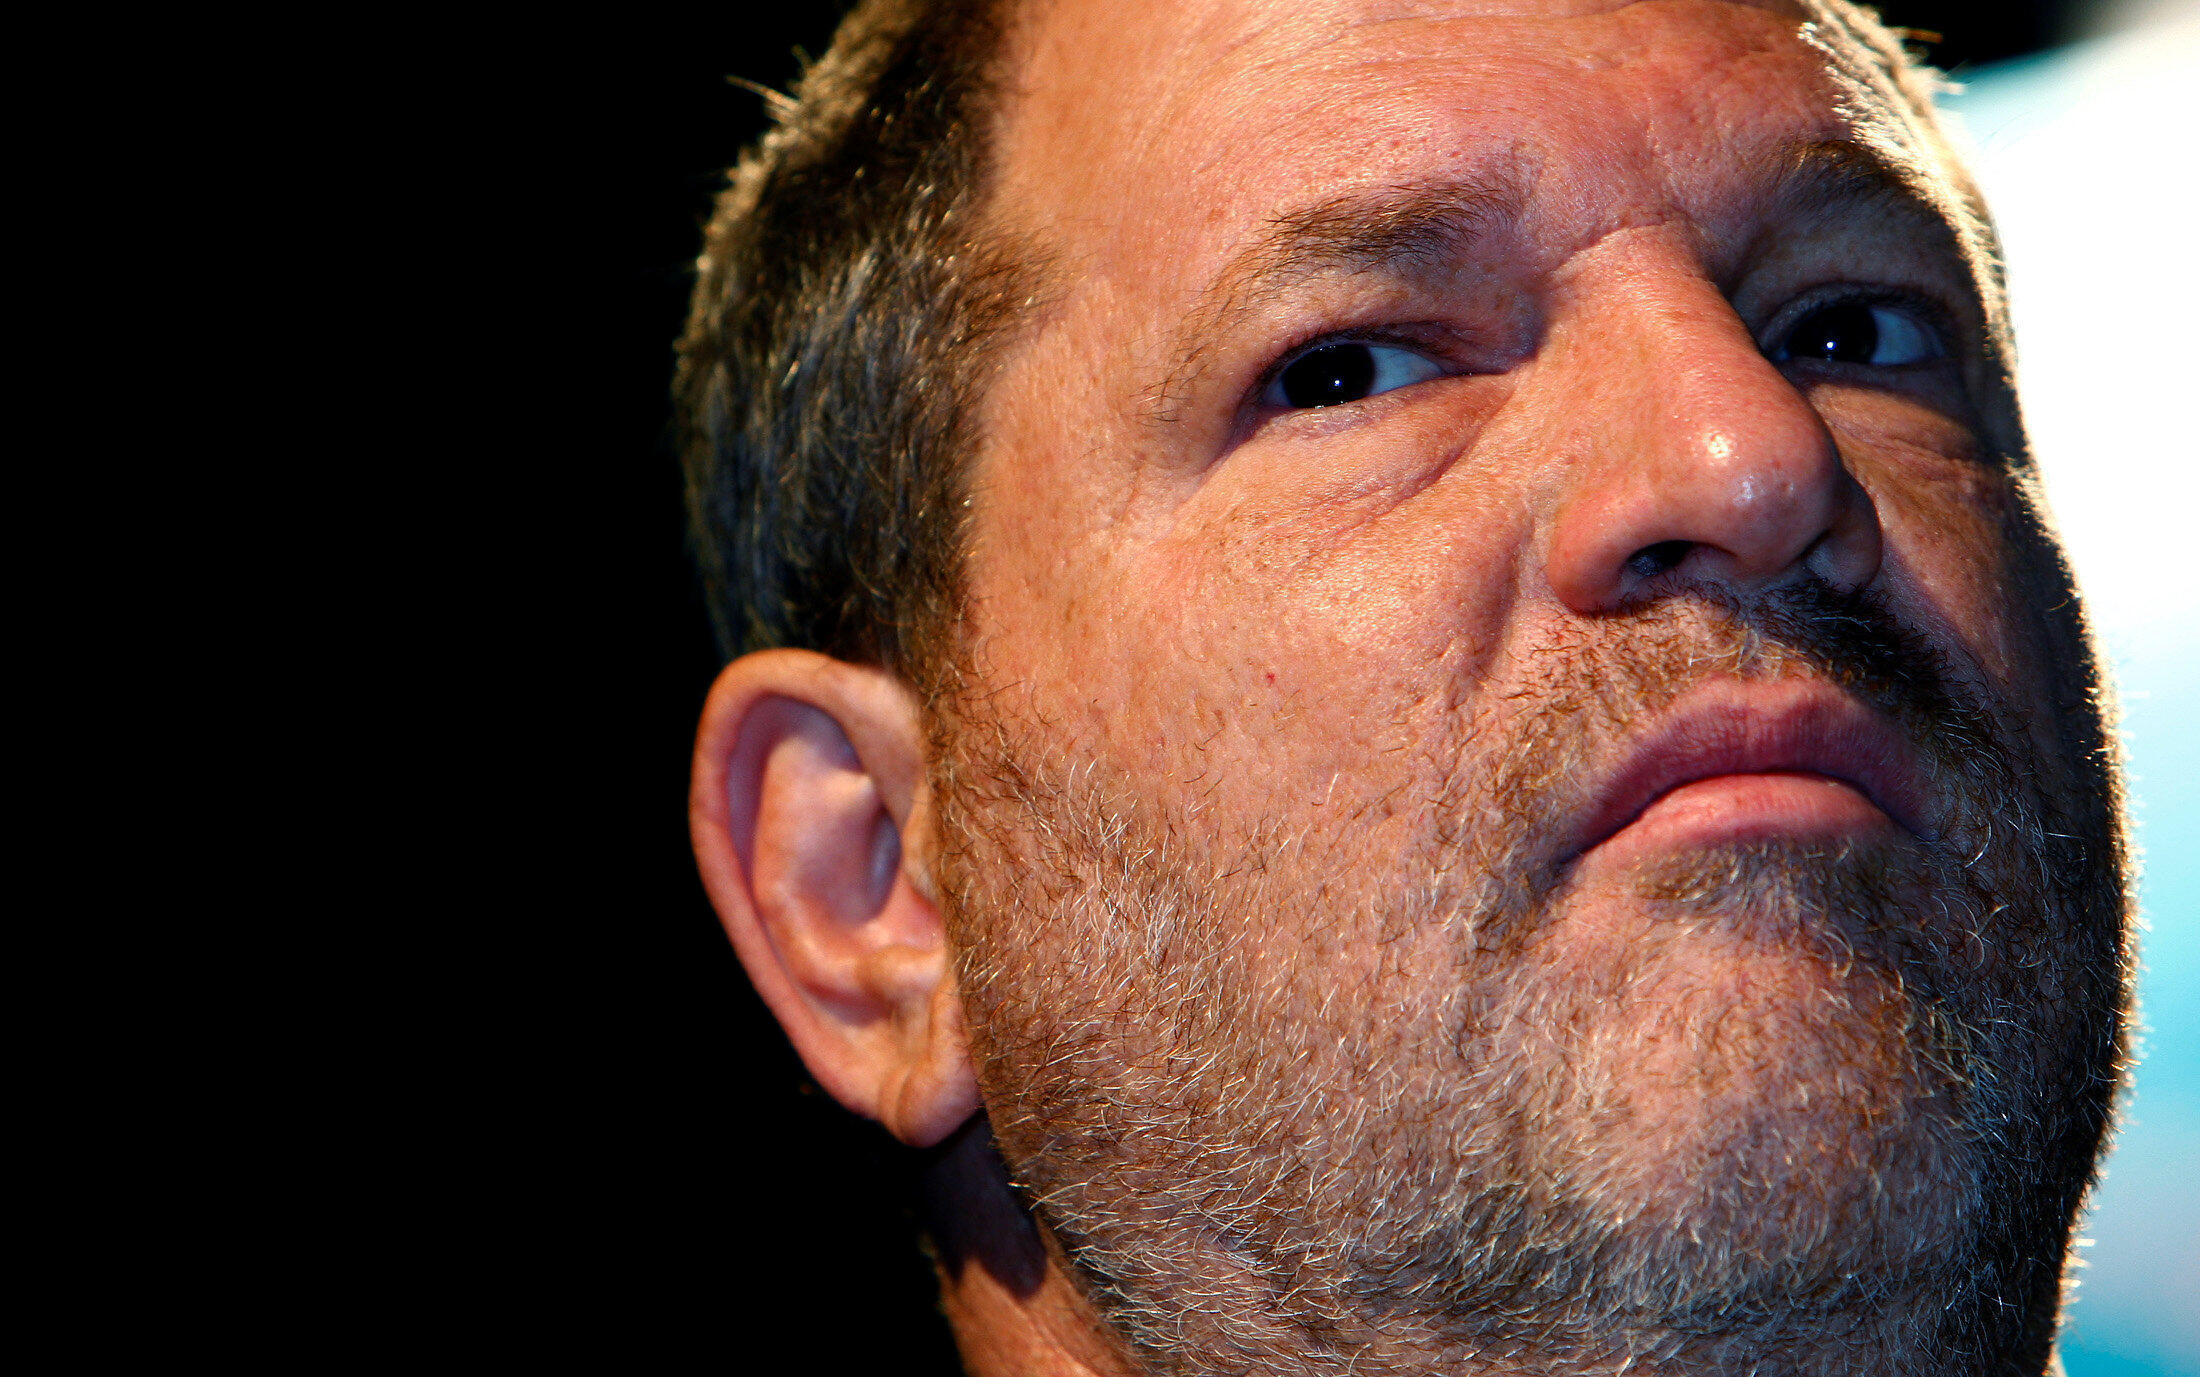 Disgreaced Hollywoon moghul Harvey Weinstein